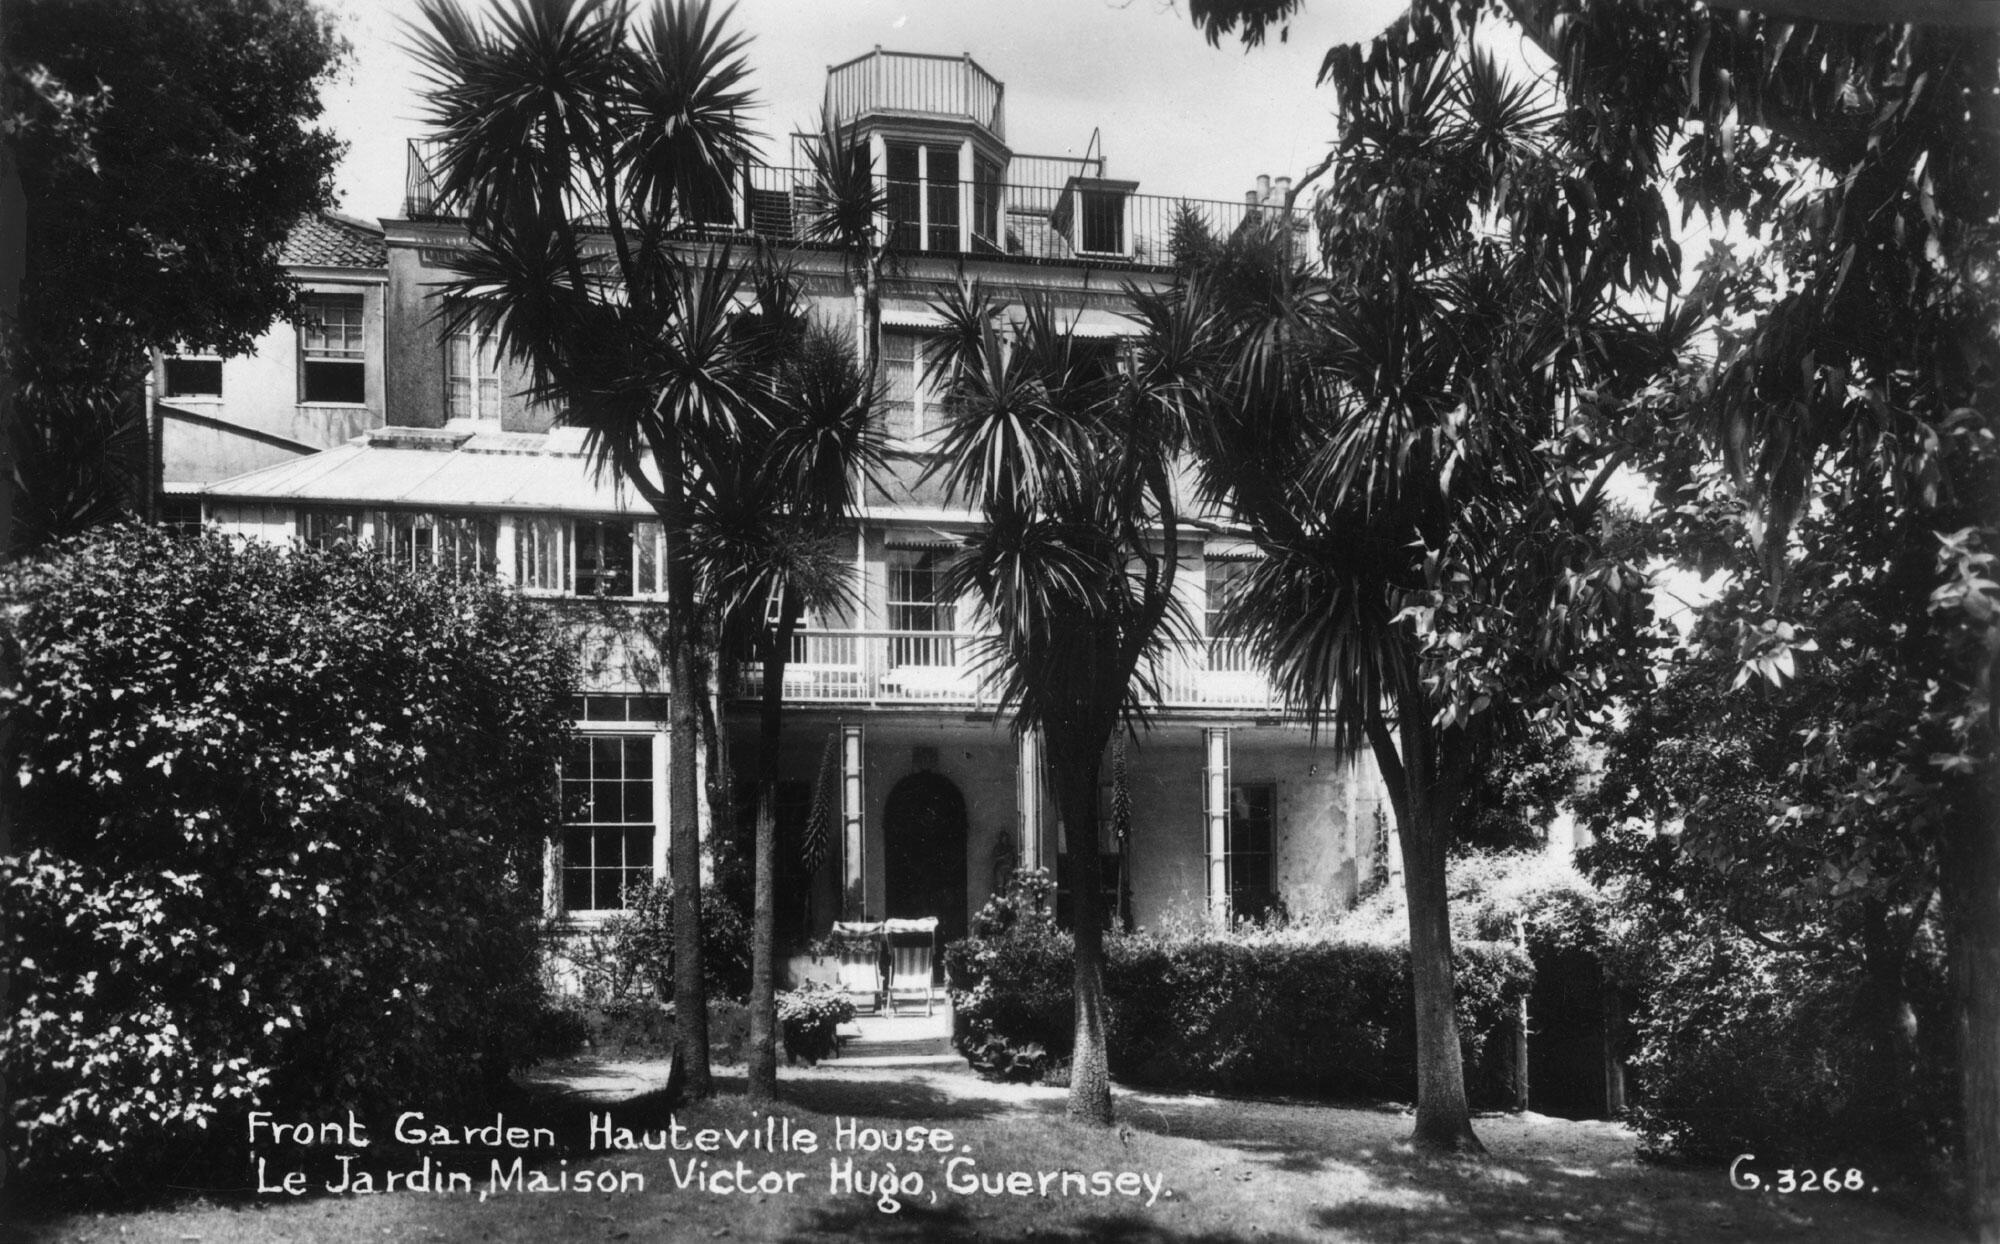 Hauteville House, Guernesey.